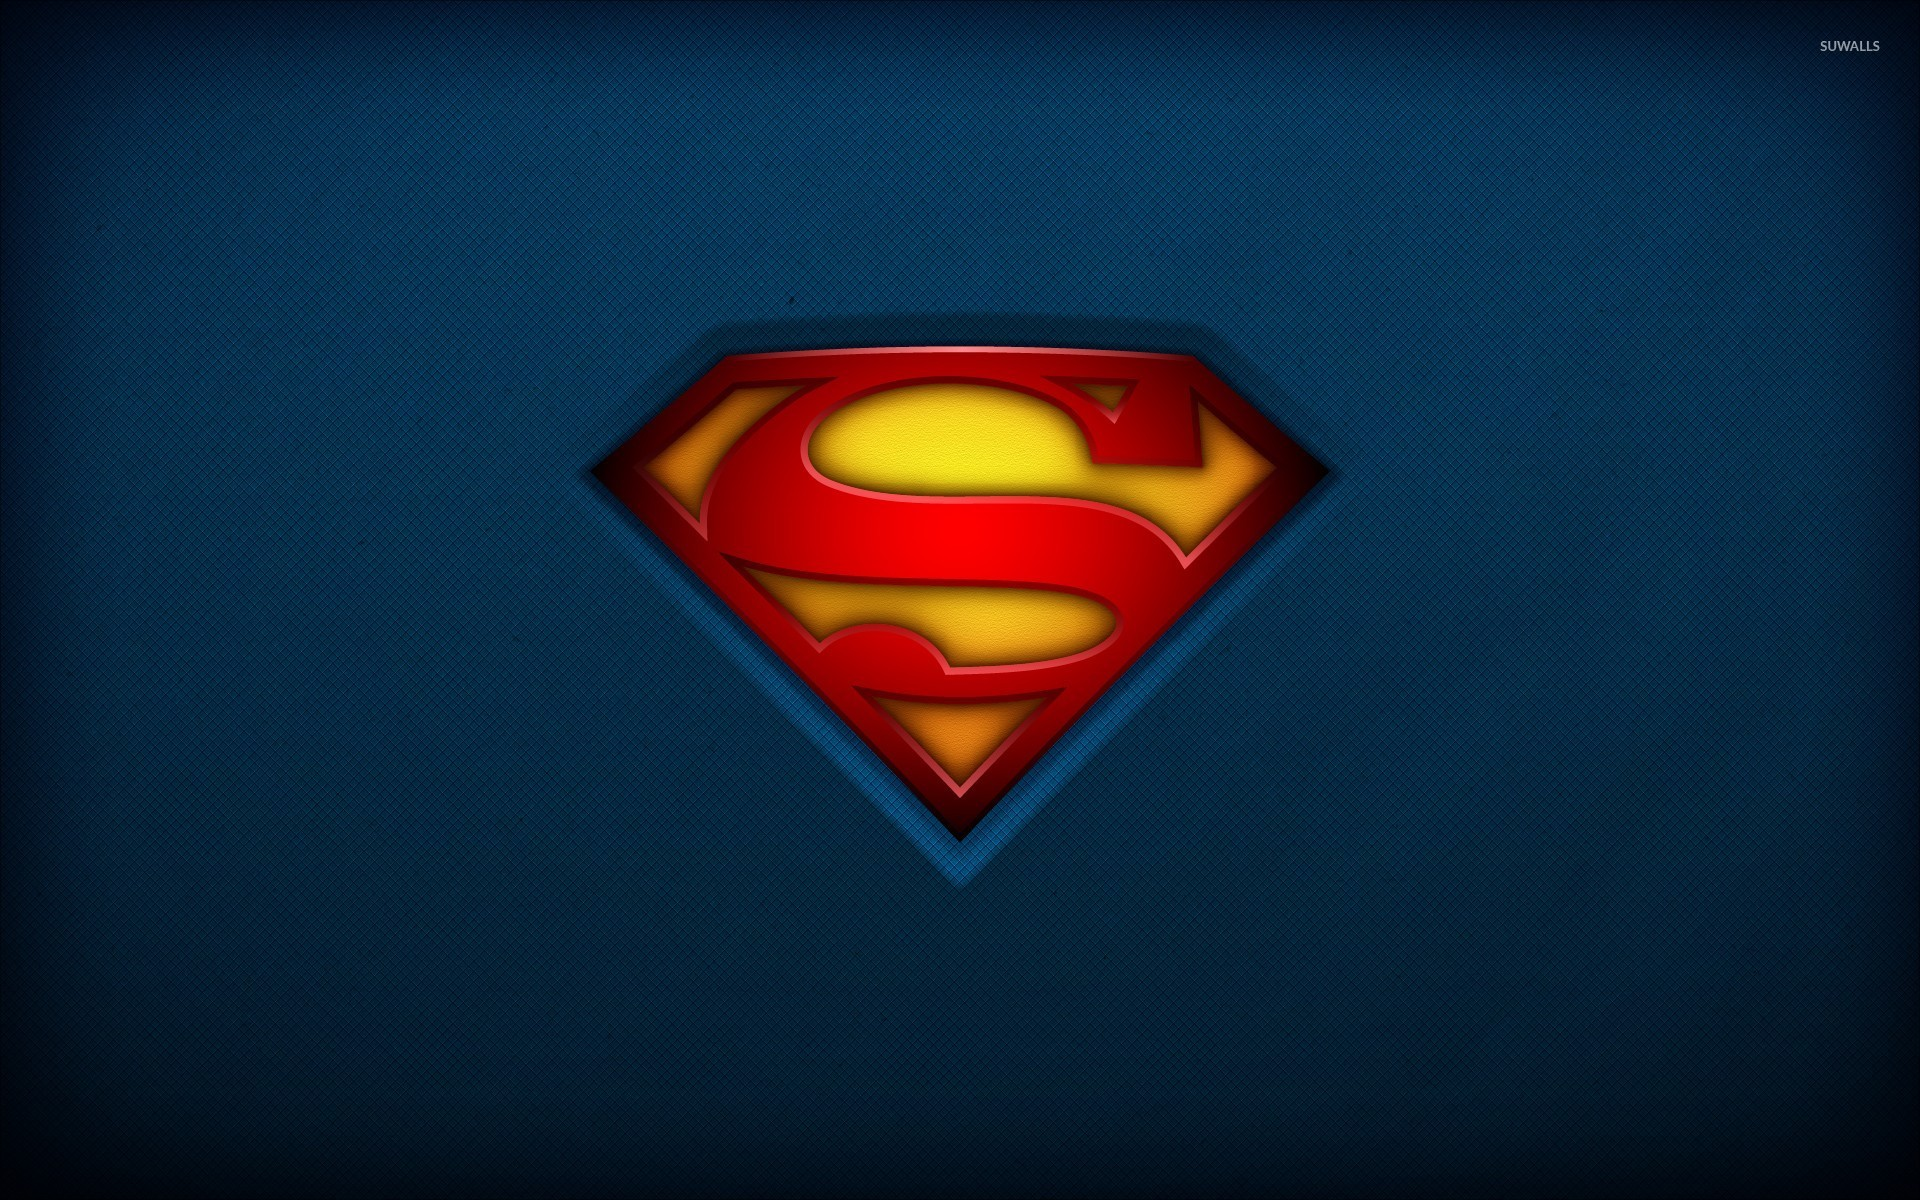 superman logo wallpaper comic wallpapers 32437